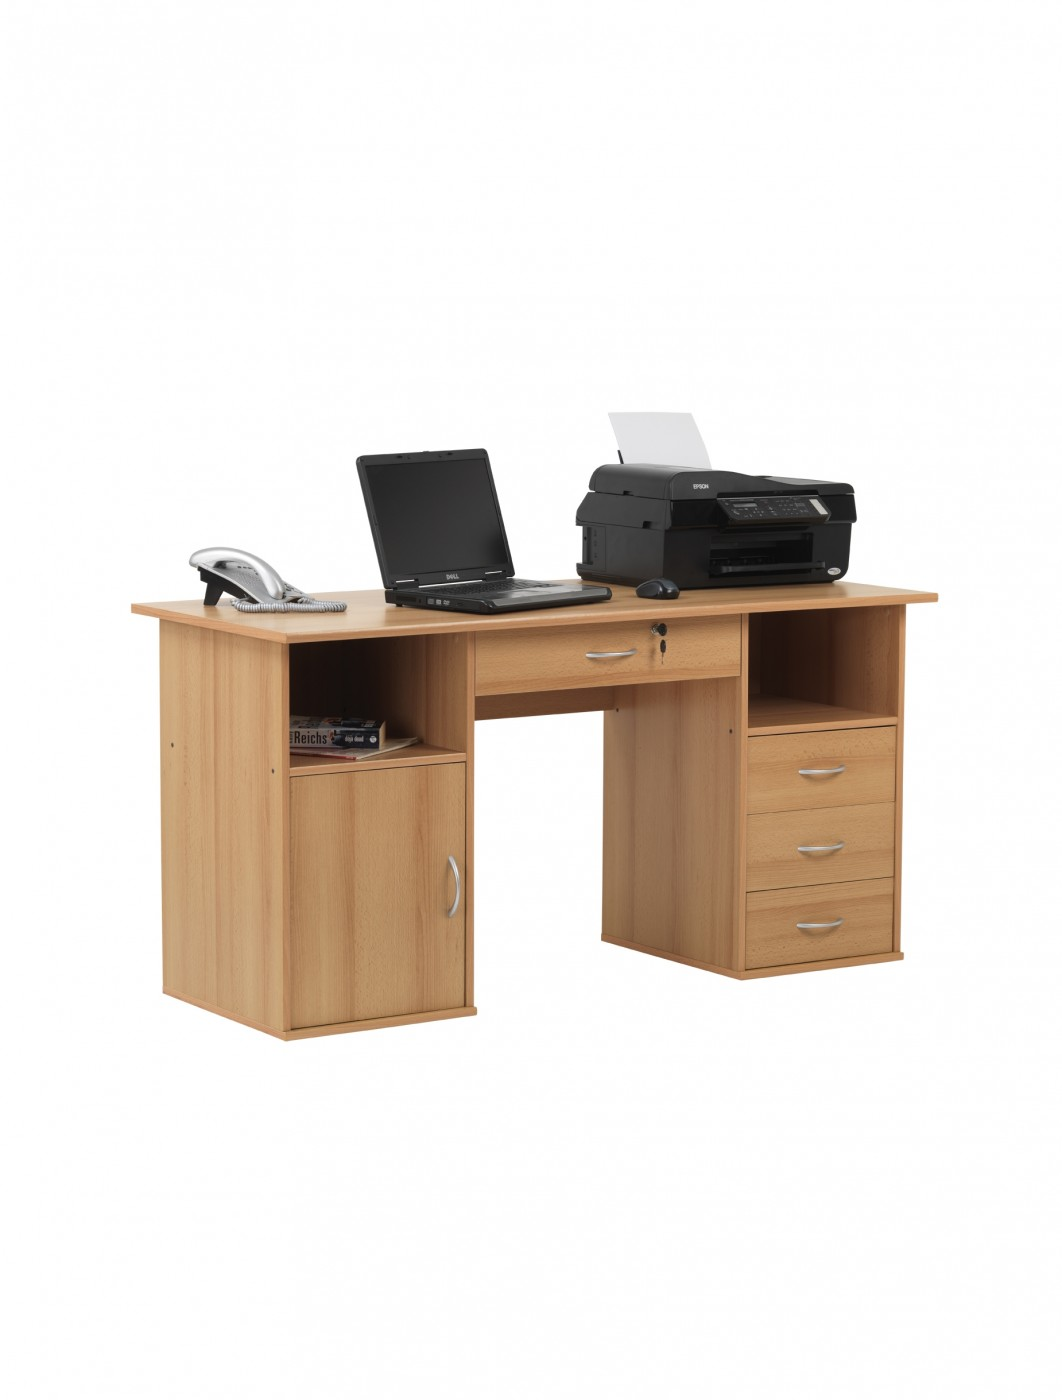 Dallas Computer Workstation AW12289